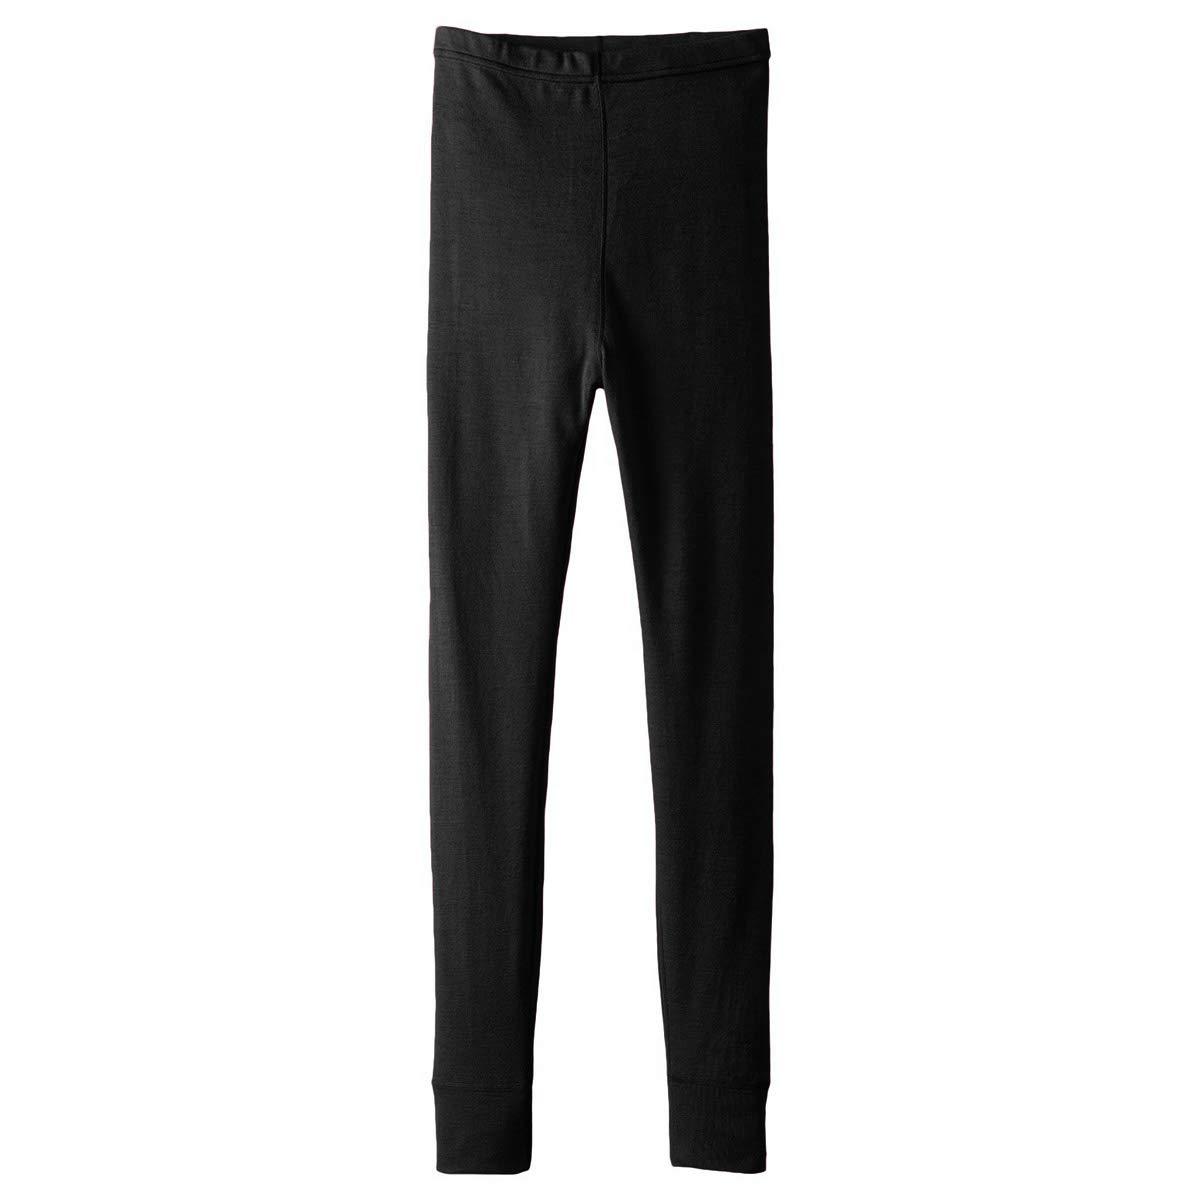 Minus33 Merino Wool Clothing Boys T-Rex Midweight Wool Bottom, Black, Small